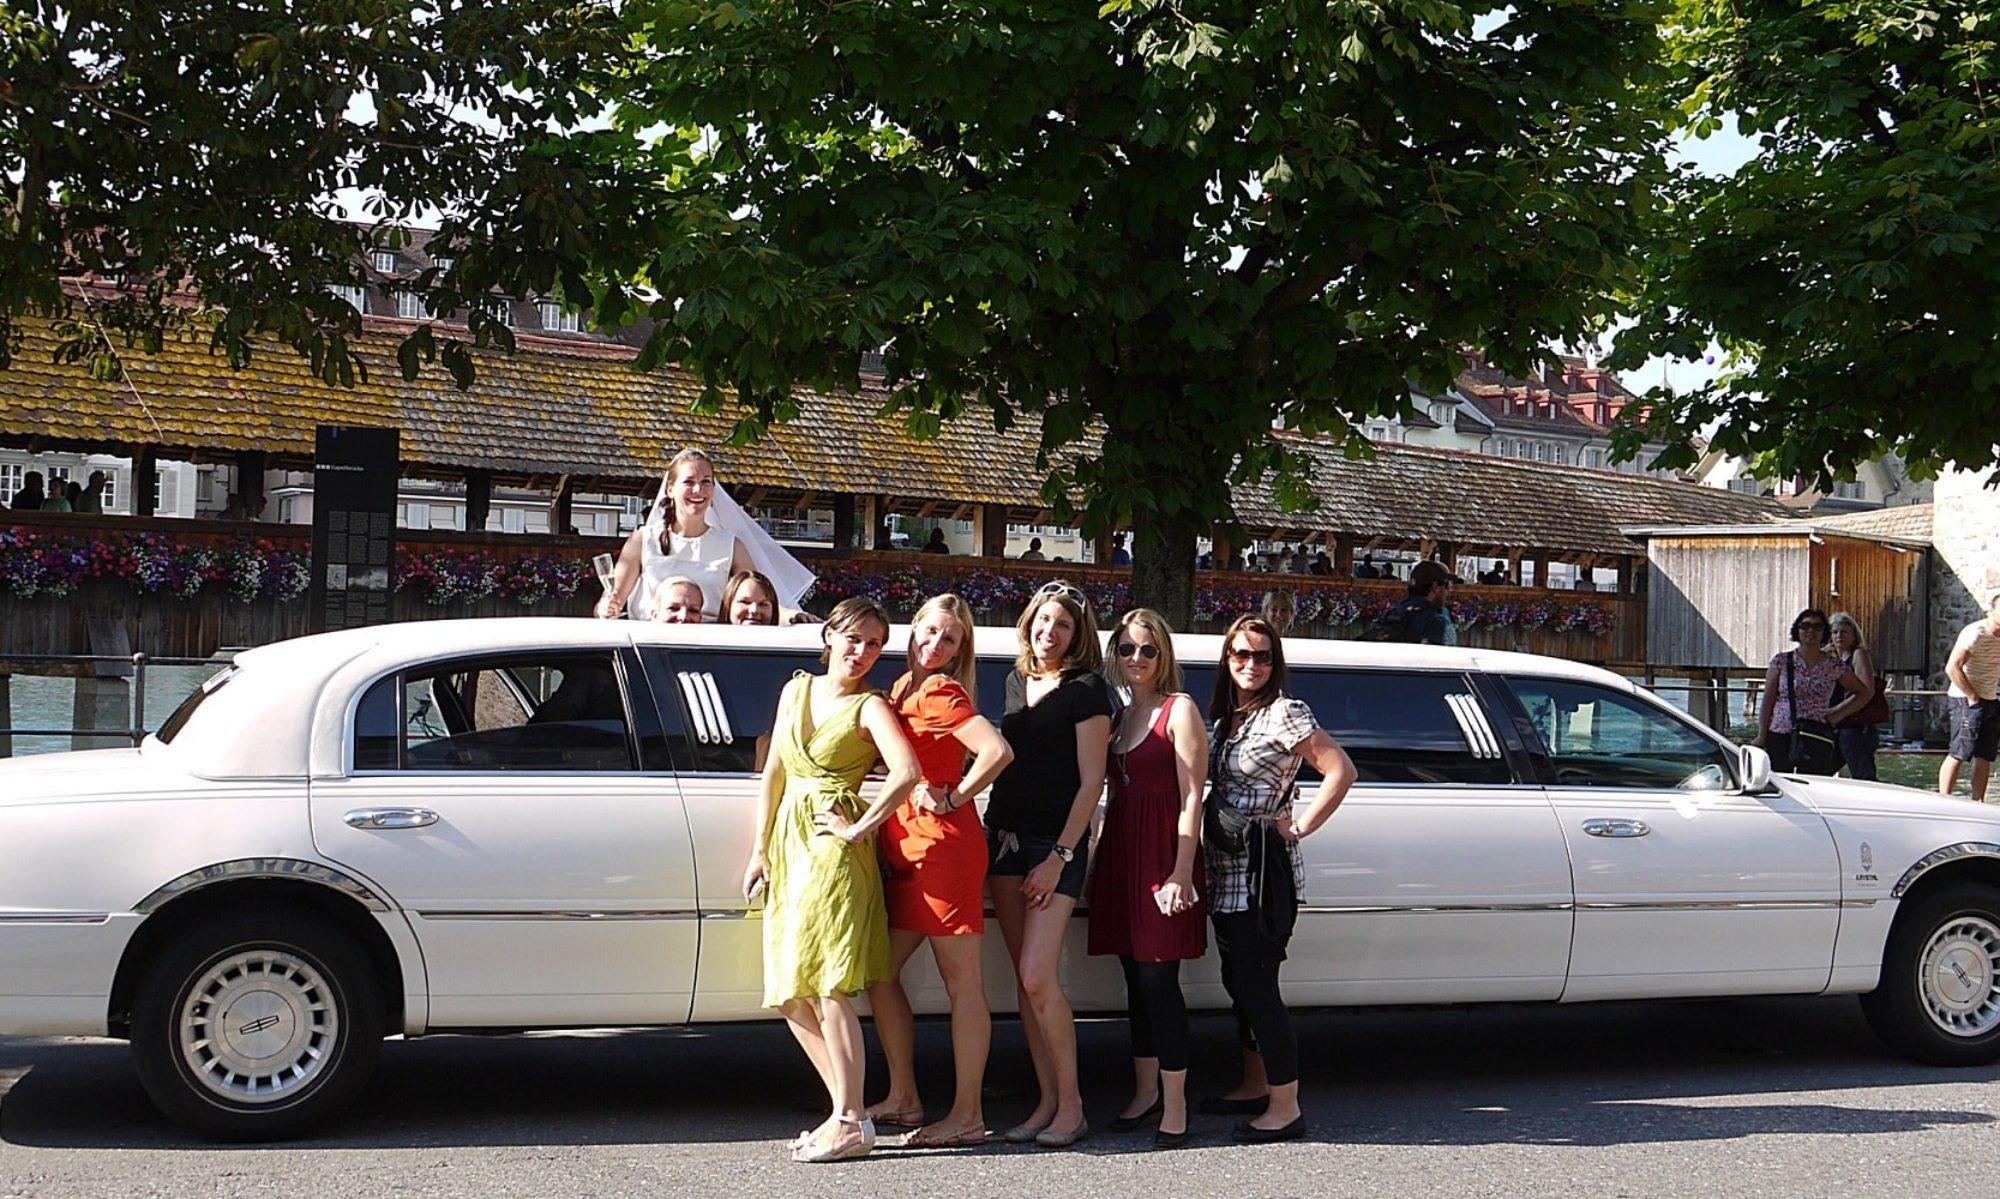 Limousine mieten Luzern - Stretchlimousine Luzern